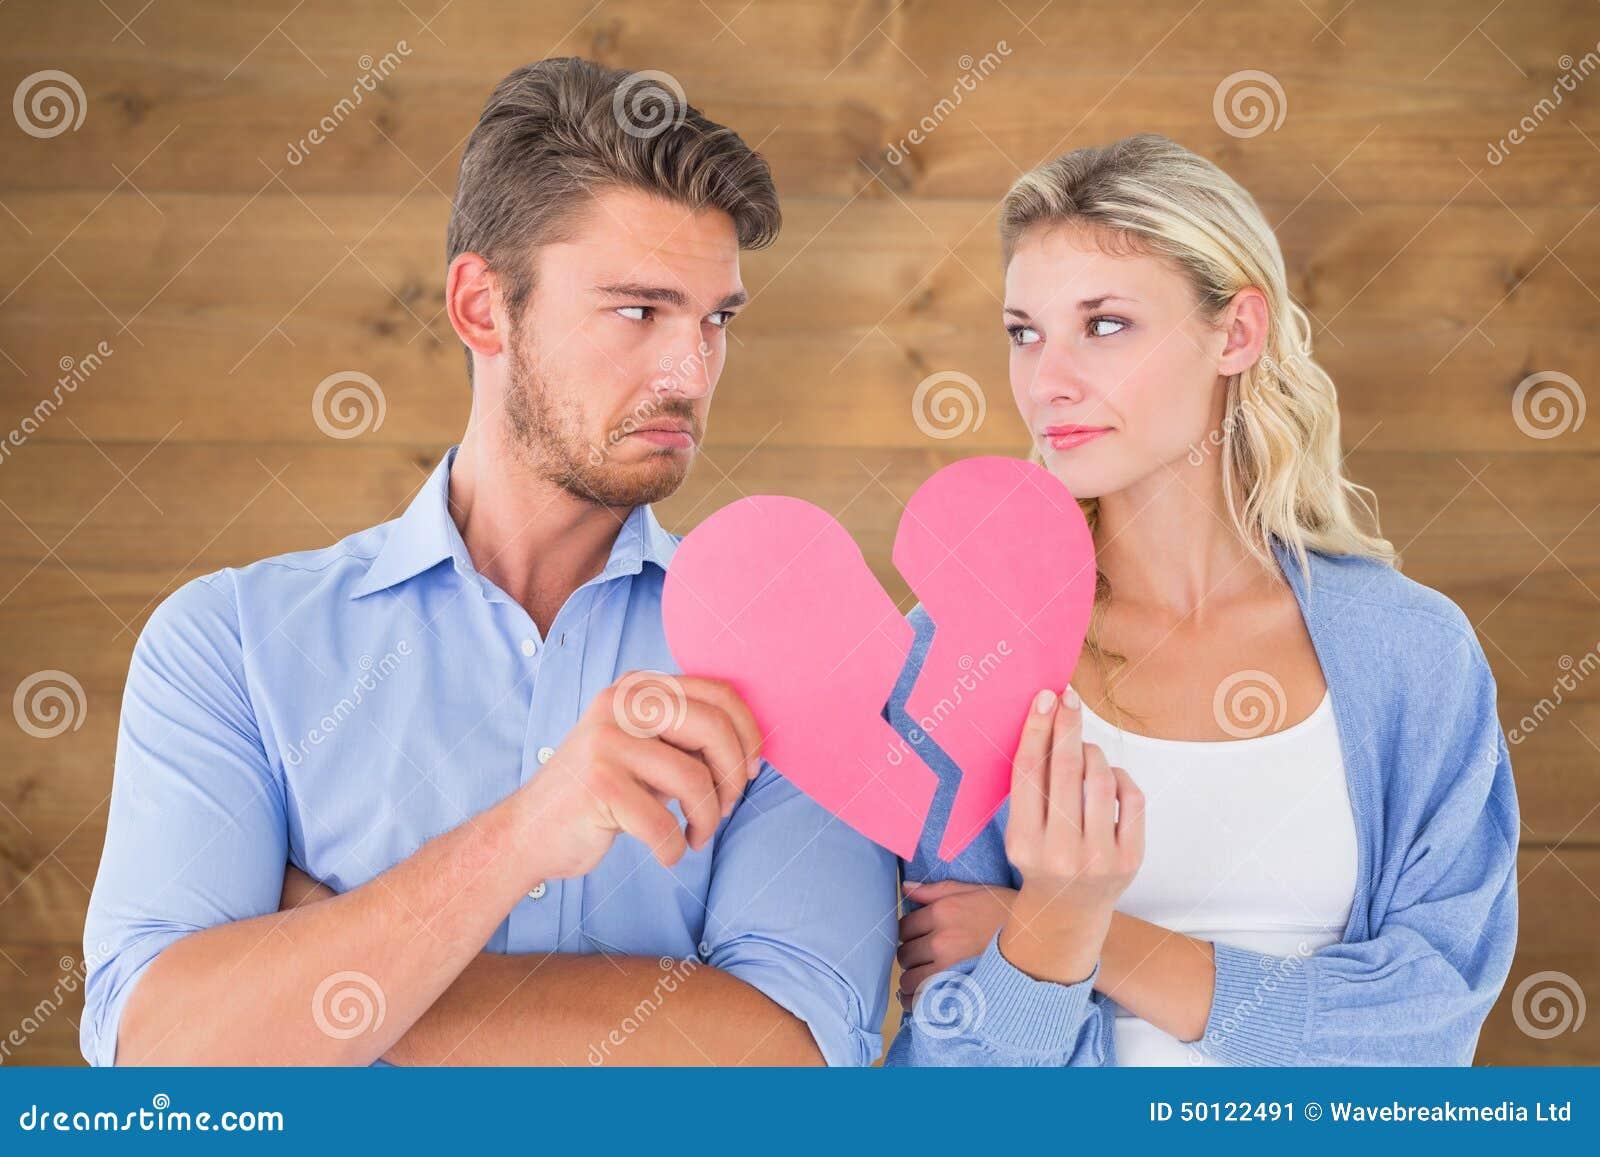 Edmonton dating idéer